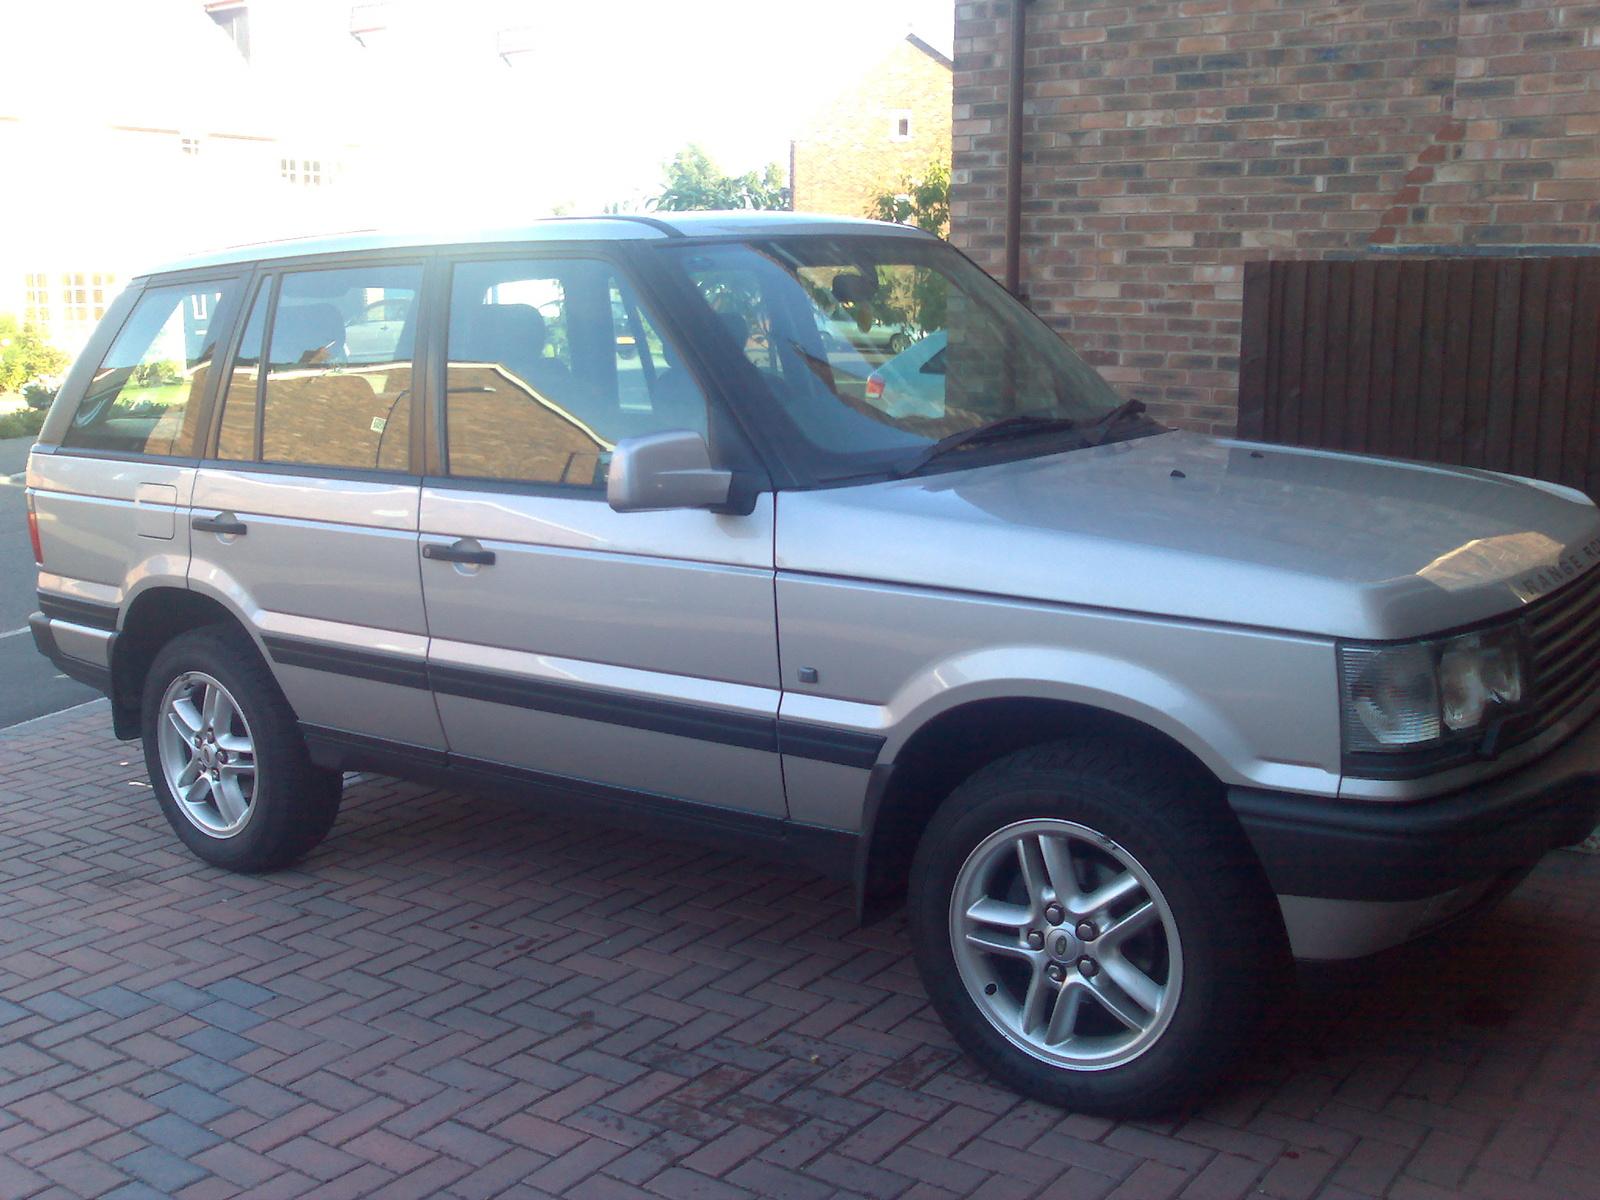 2000 Land Rover Range Rover Pictures Cargurus